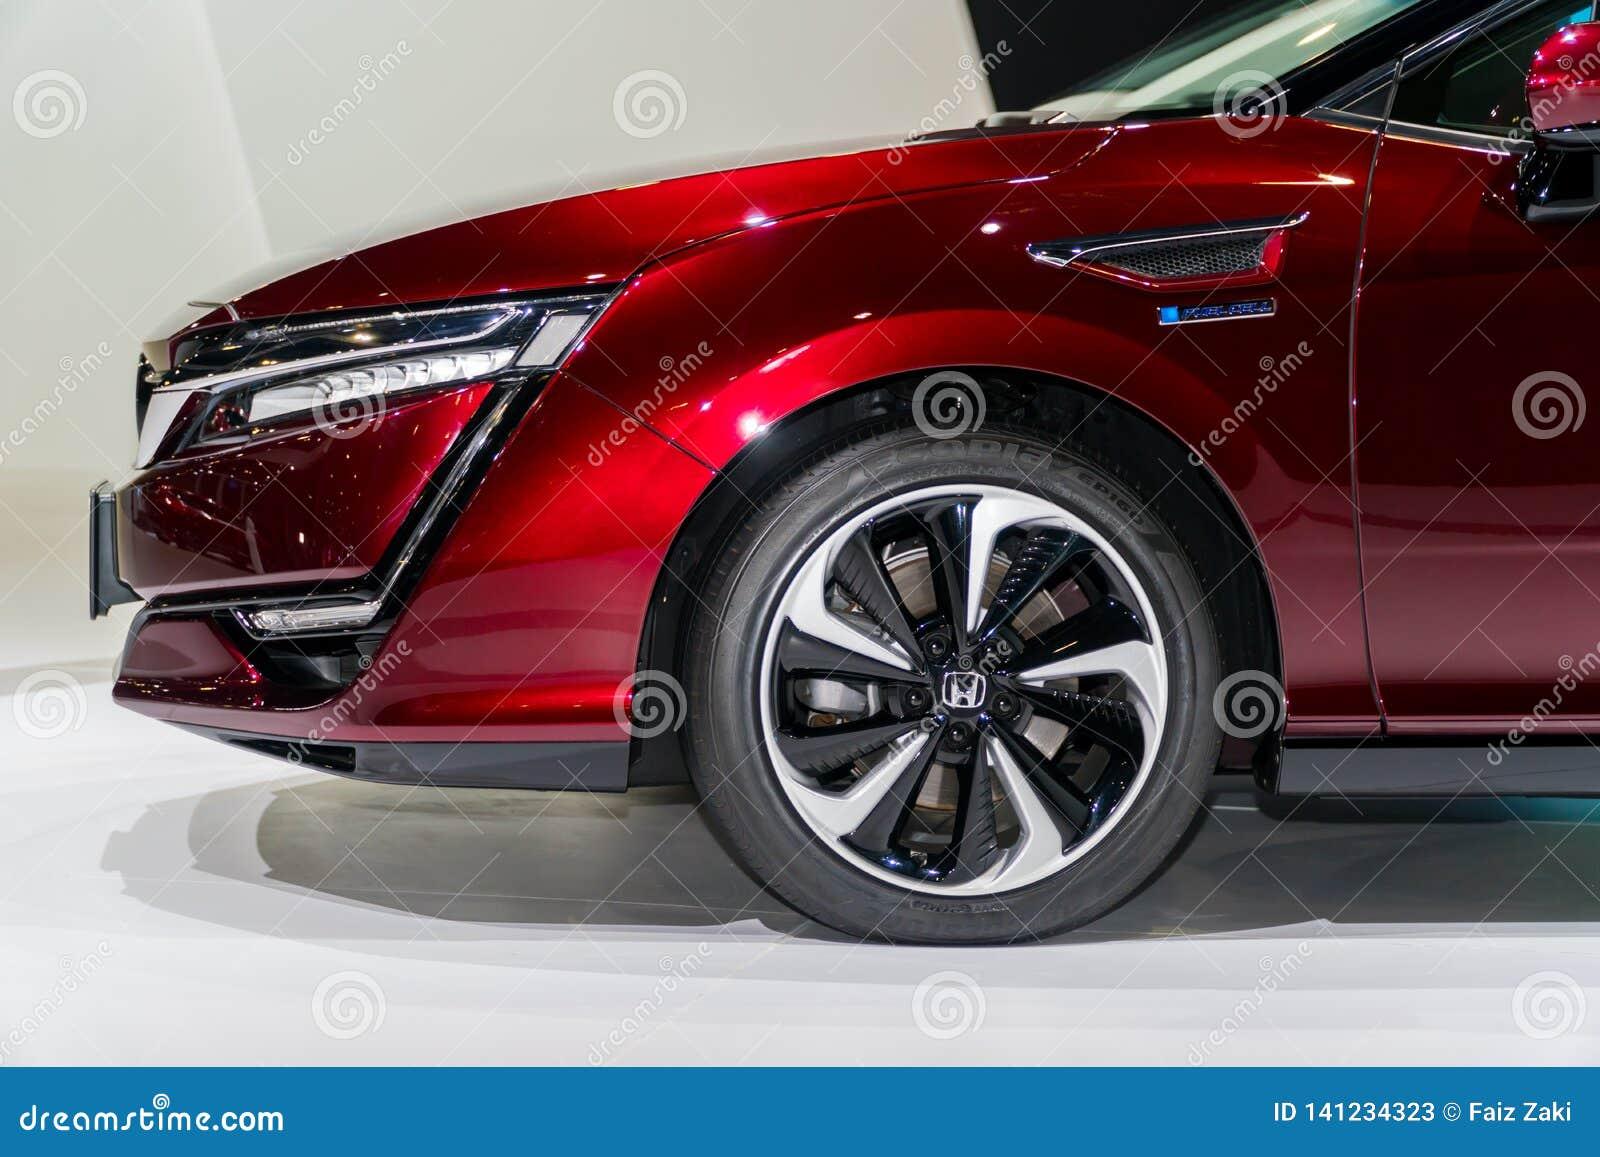 Honda-Duidelijkheid Fuel Cell in Kuala Lumpur Motor Show